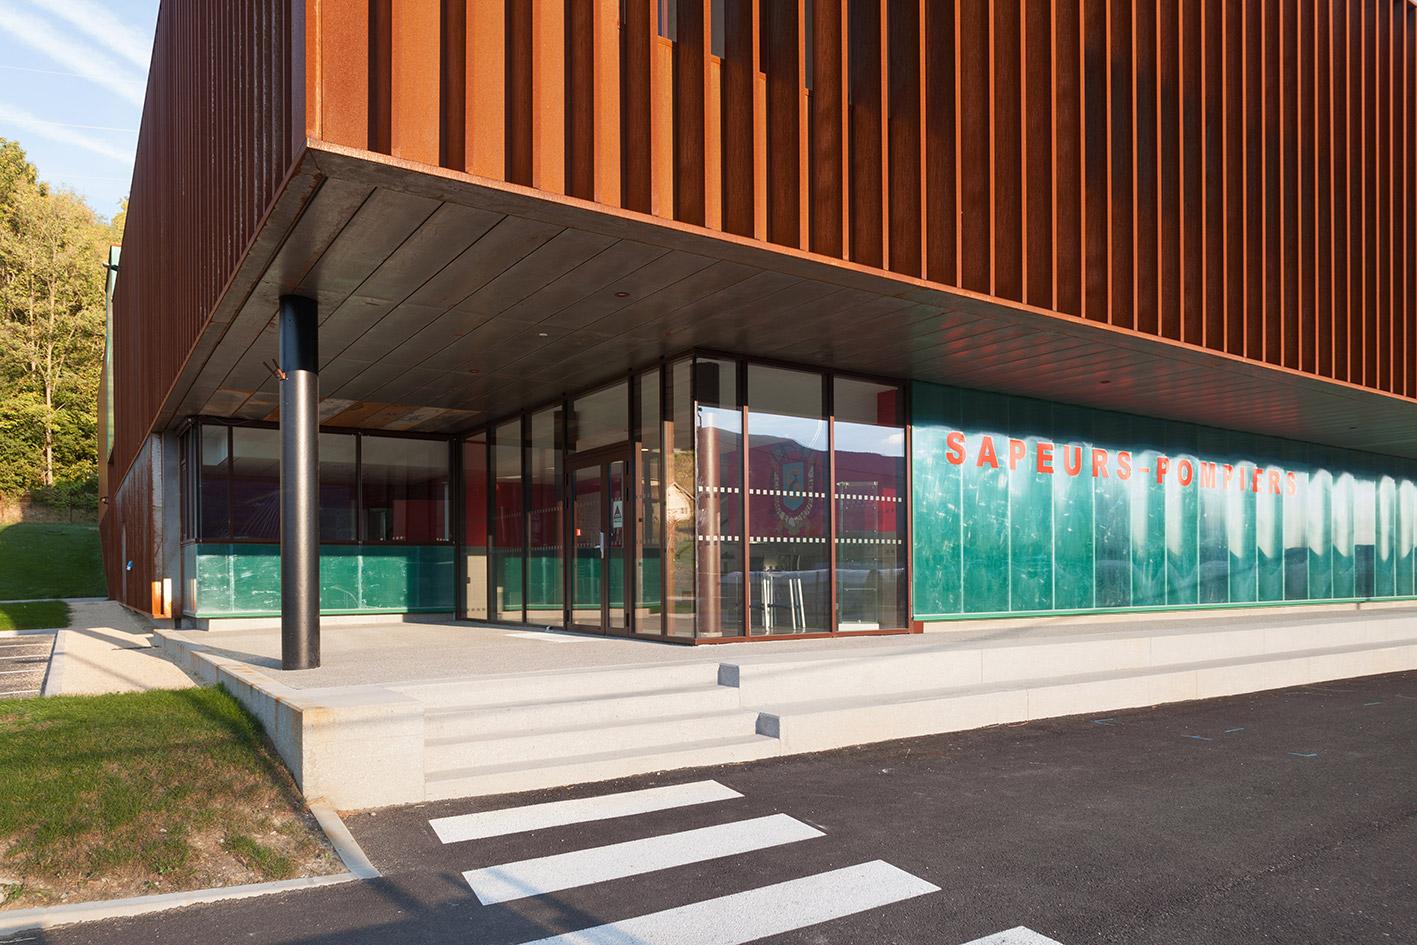 jerome-ricolleau-photographe-architecture-lyon-Composite-grenoble-sdis-caserne-pompiers-seyssel-6